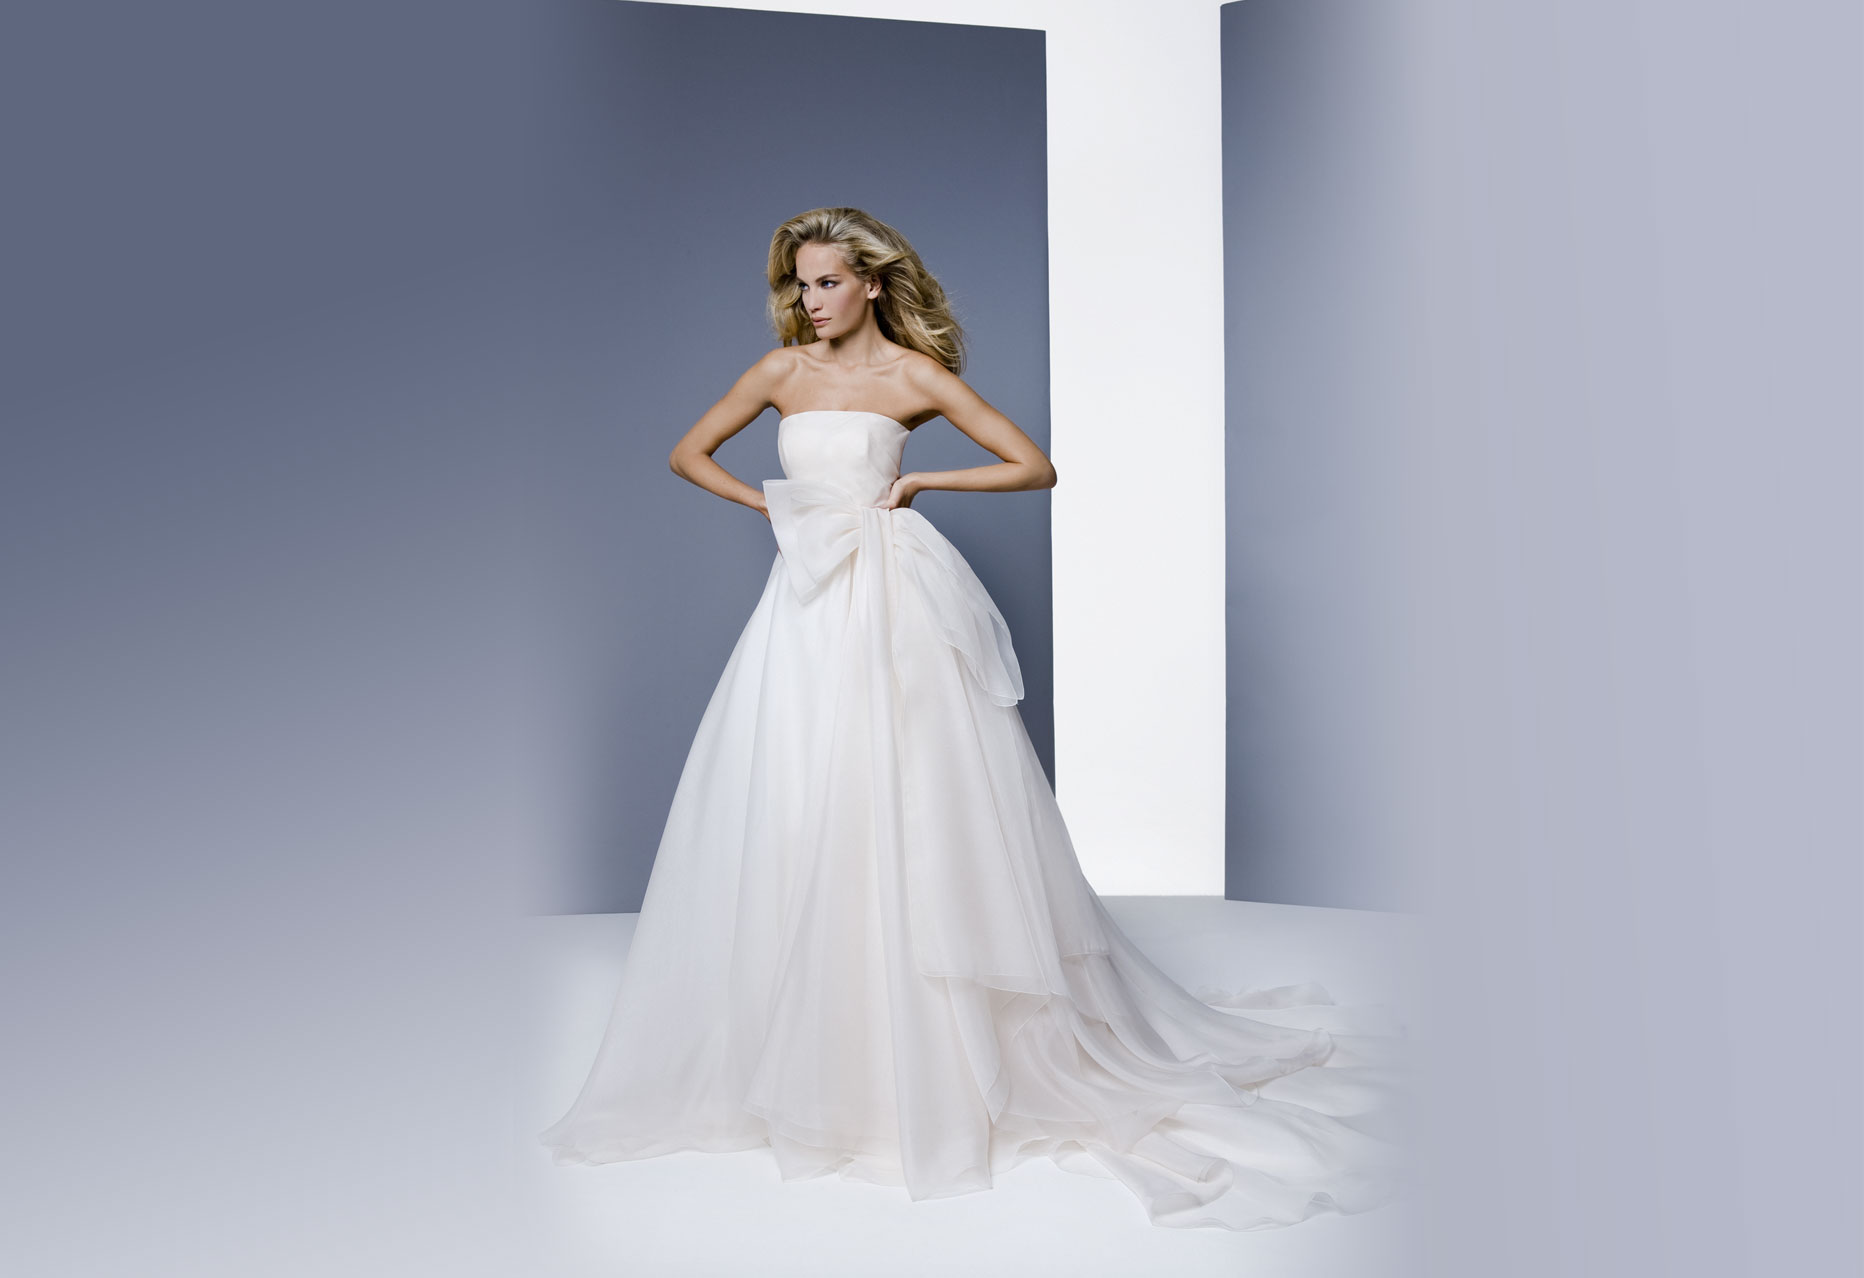 Pure Italian Silk Wedding Dresses from Antonio Riva 1